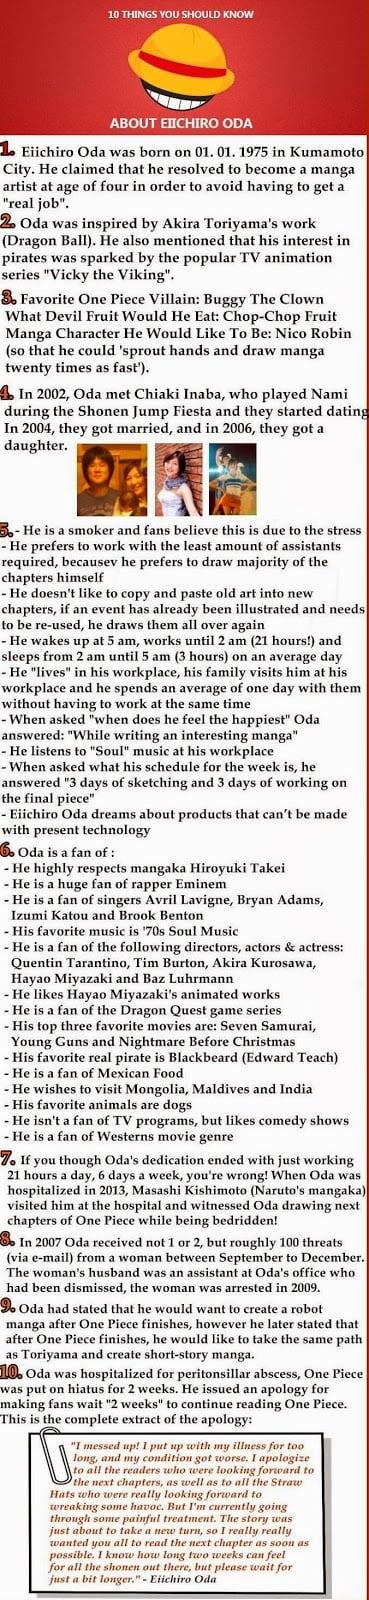 Top 10 Things About Eiichiro Oda